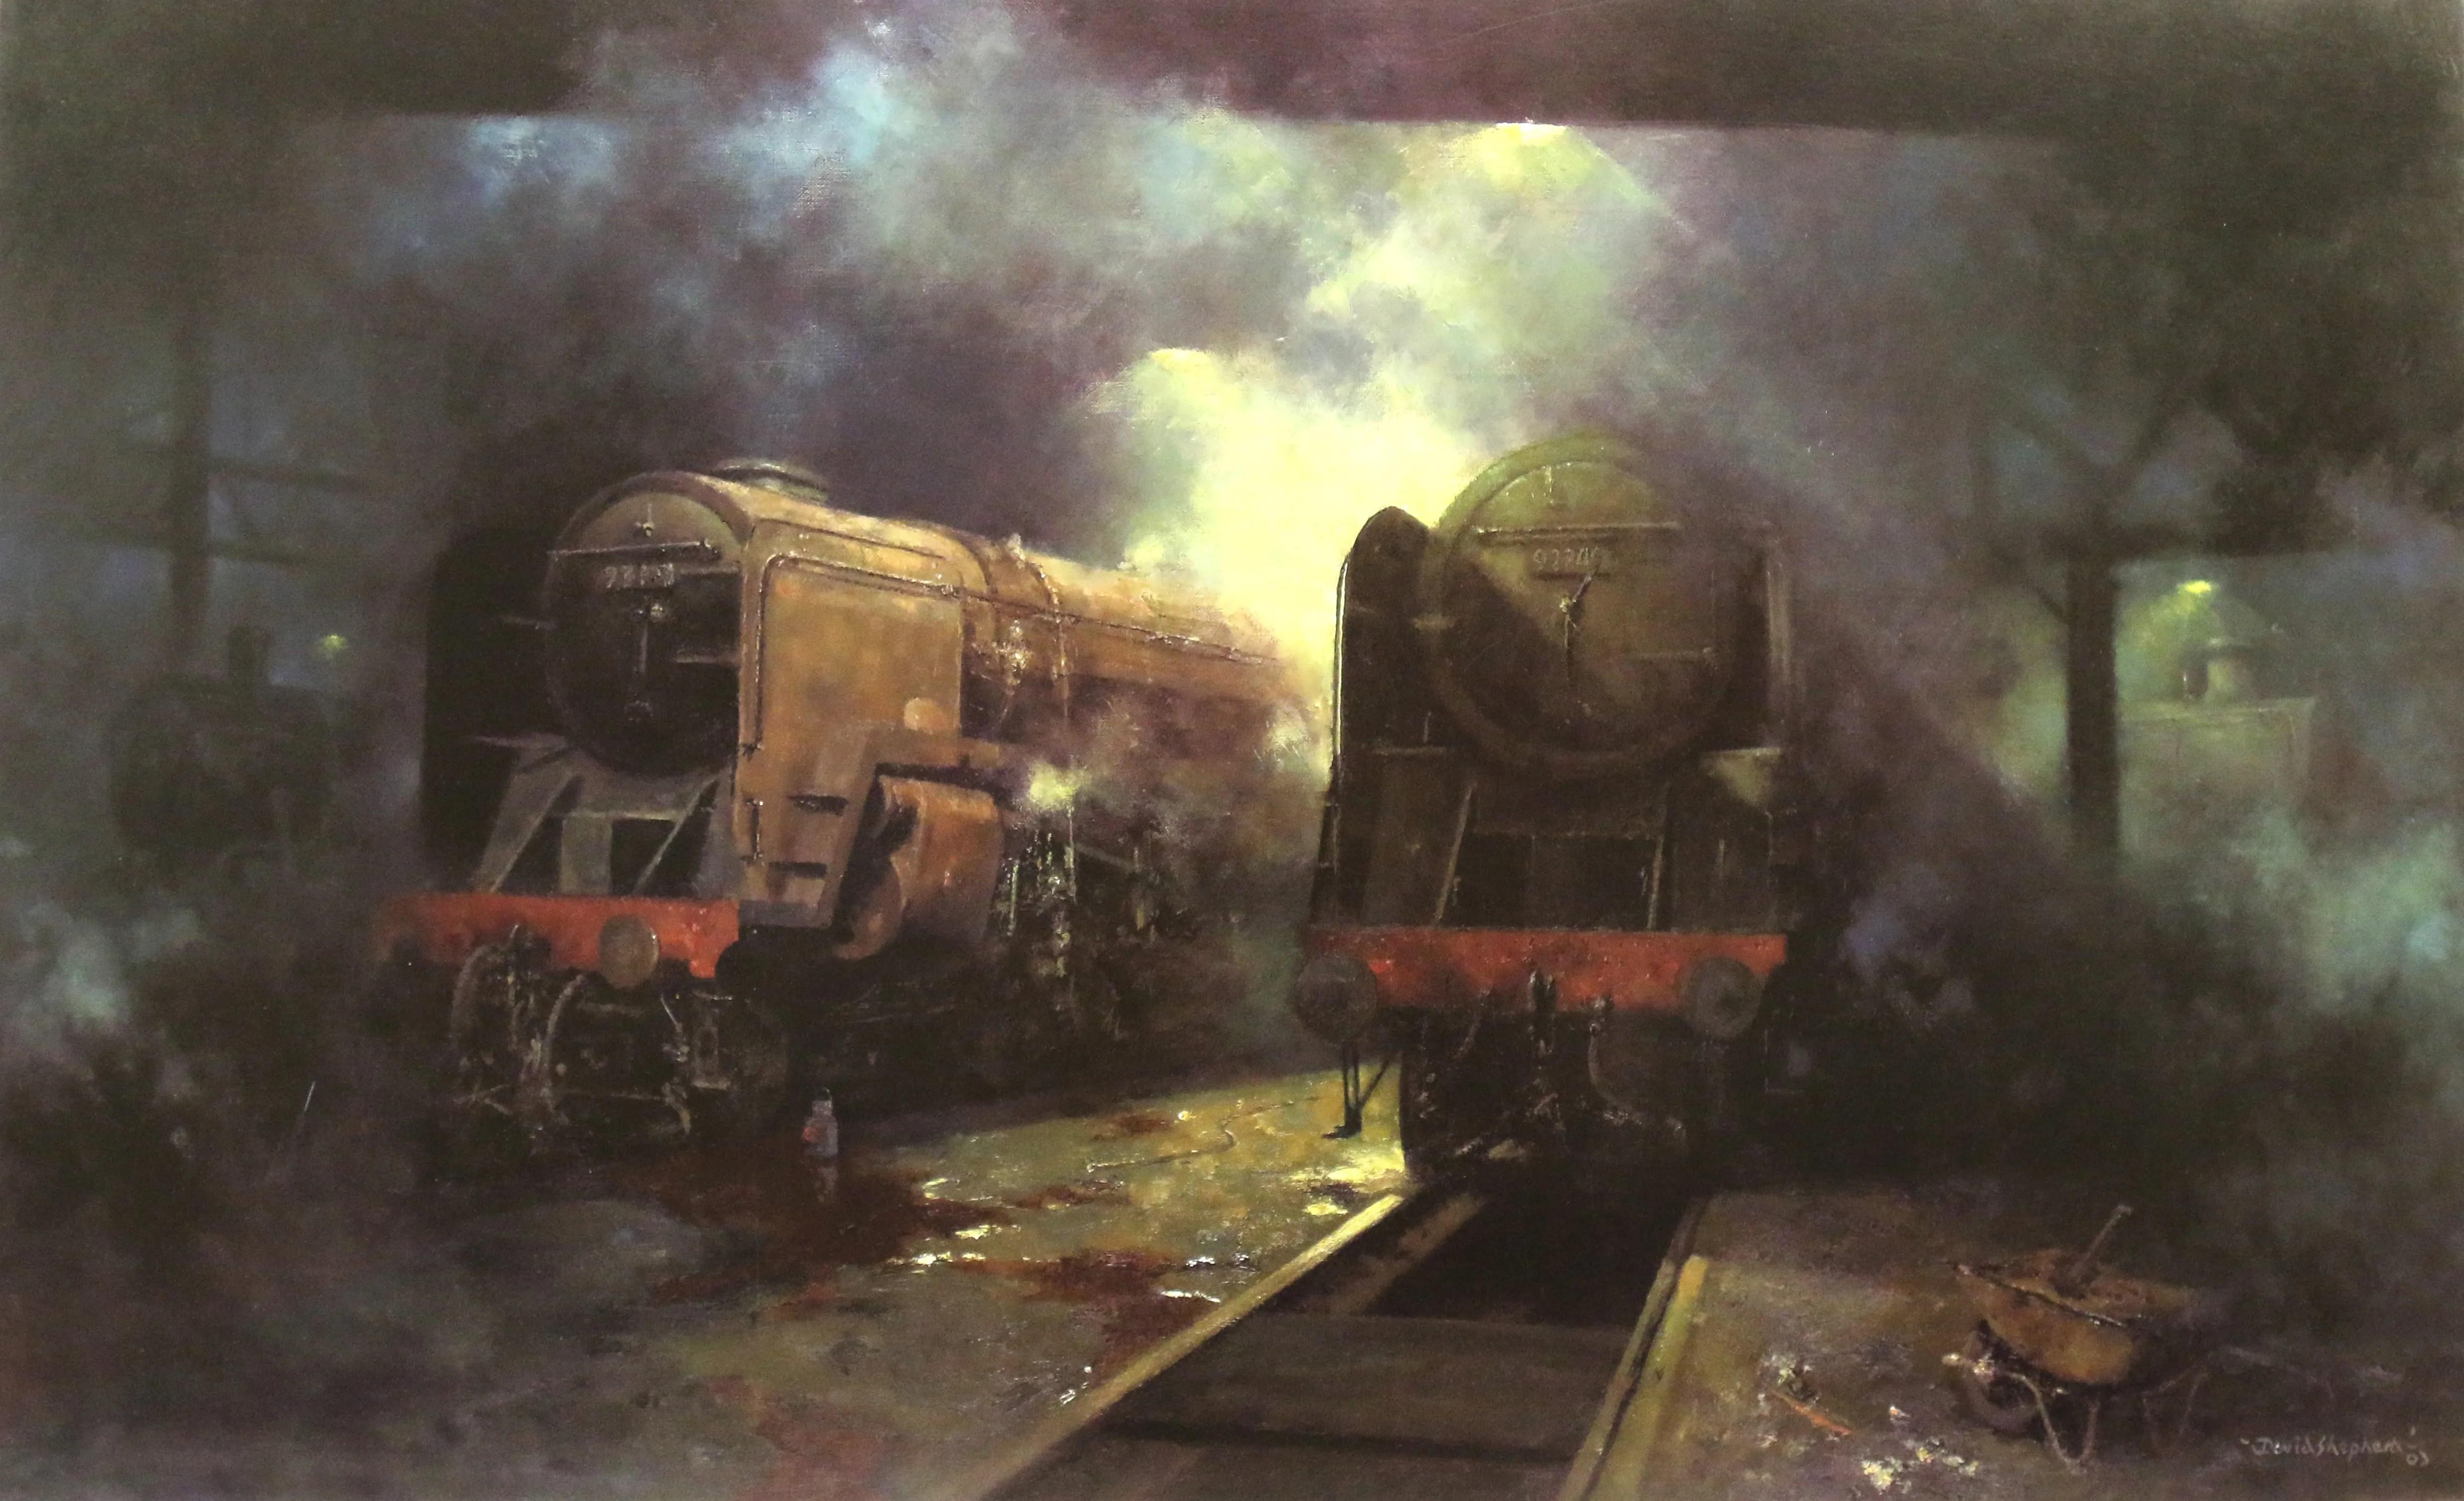 David Shepherd painting of steam locomotives - Giants at Rest